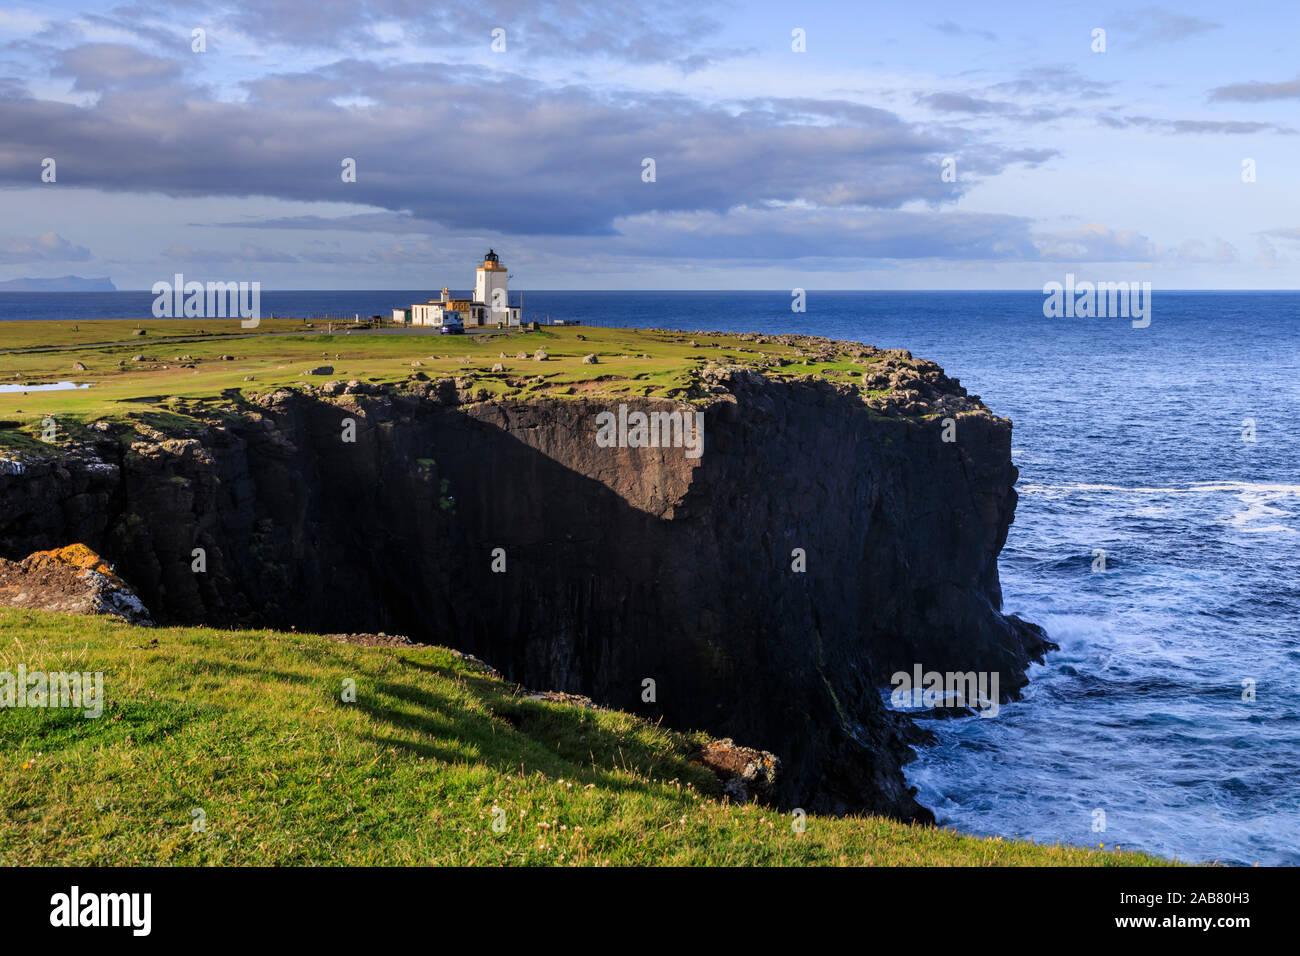 Faro Eshaness, Stevenson, 1929, acantilado de rocas, Northmavine, Continental, las Islas Shetland, Escocia, Reino Unido, Europa Foto de stock